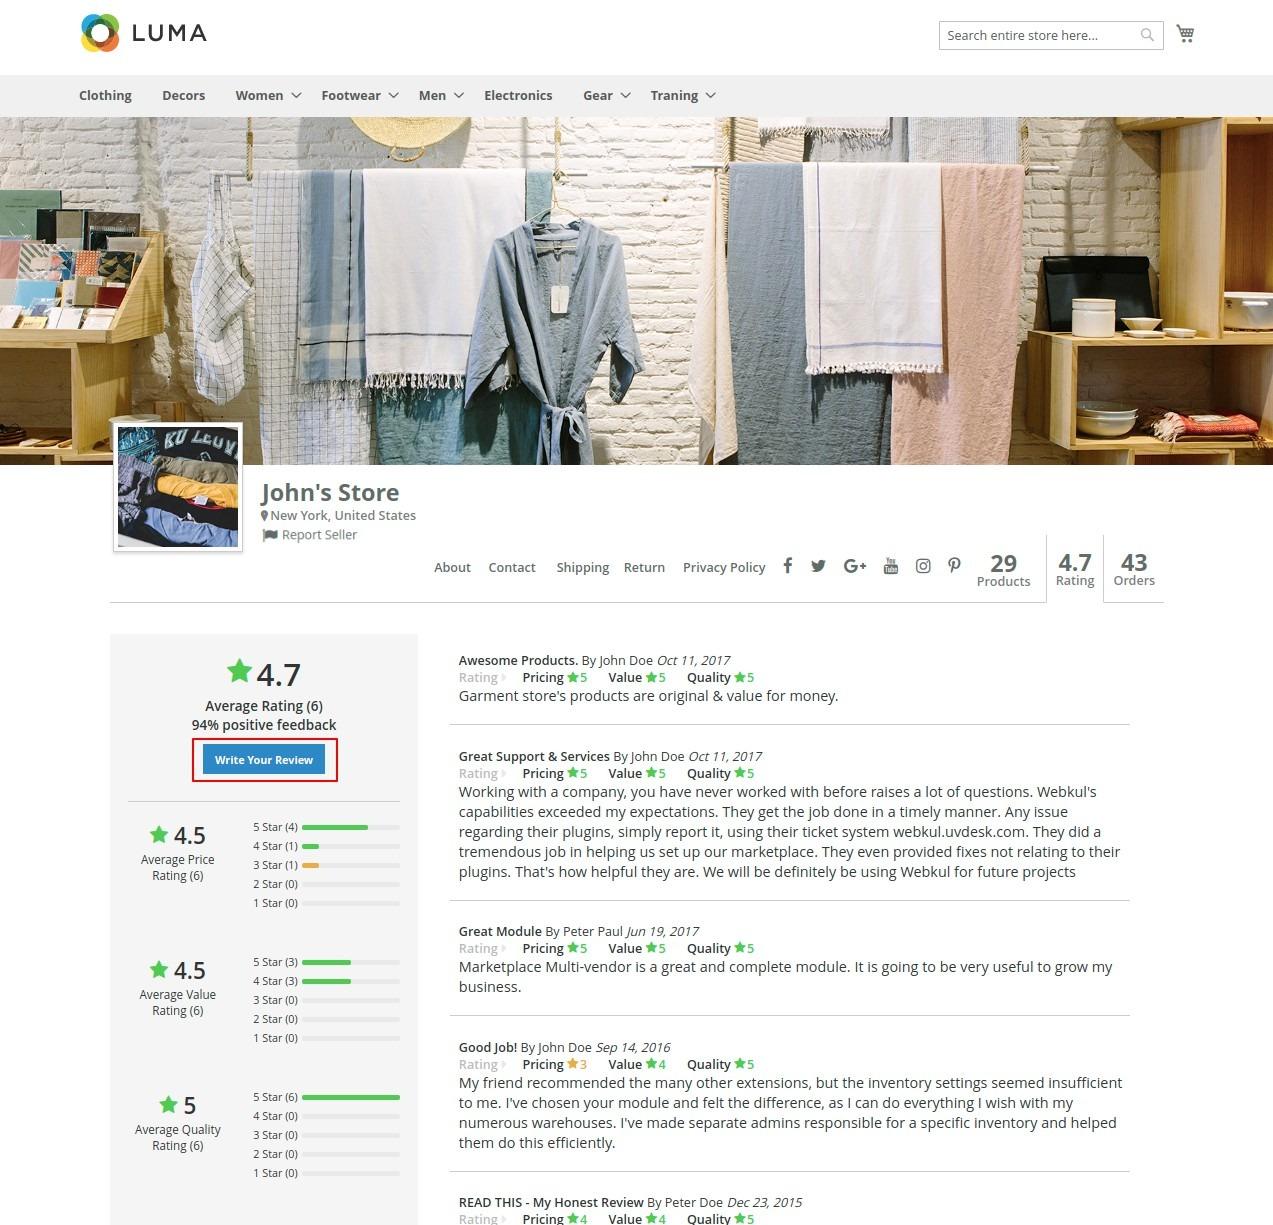 multi vendow marketplace